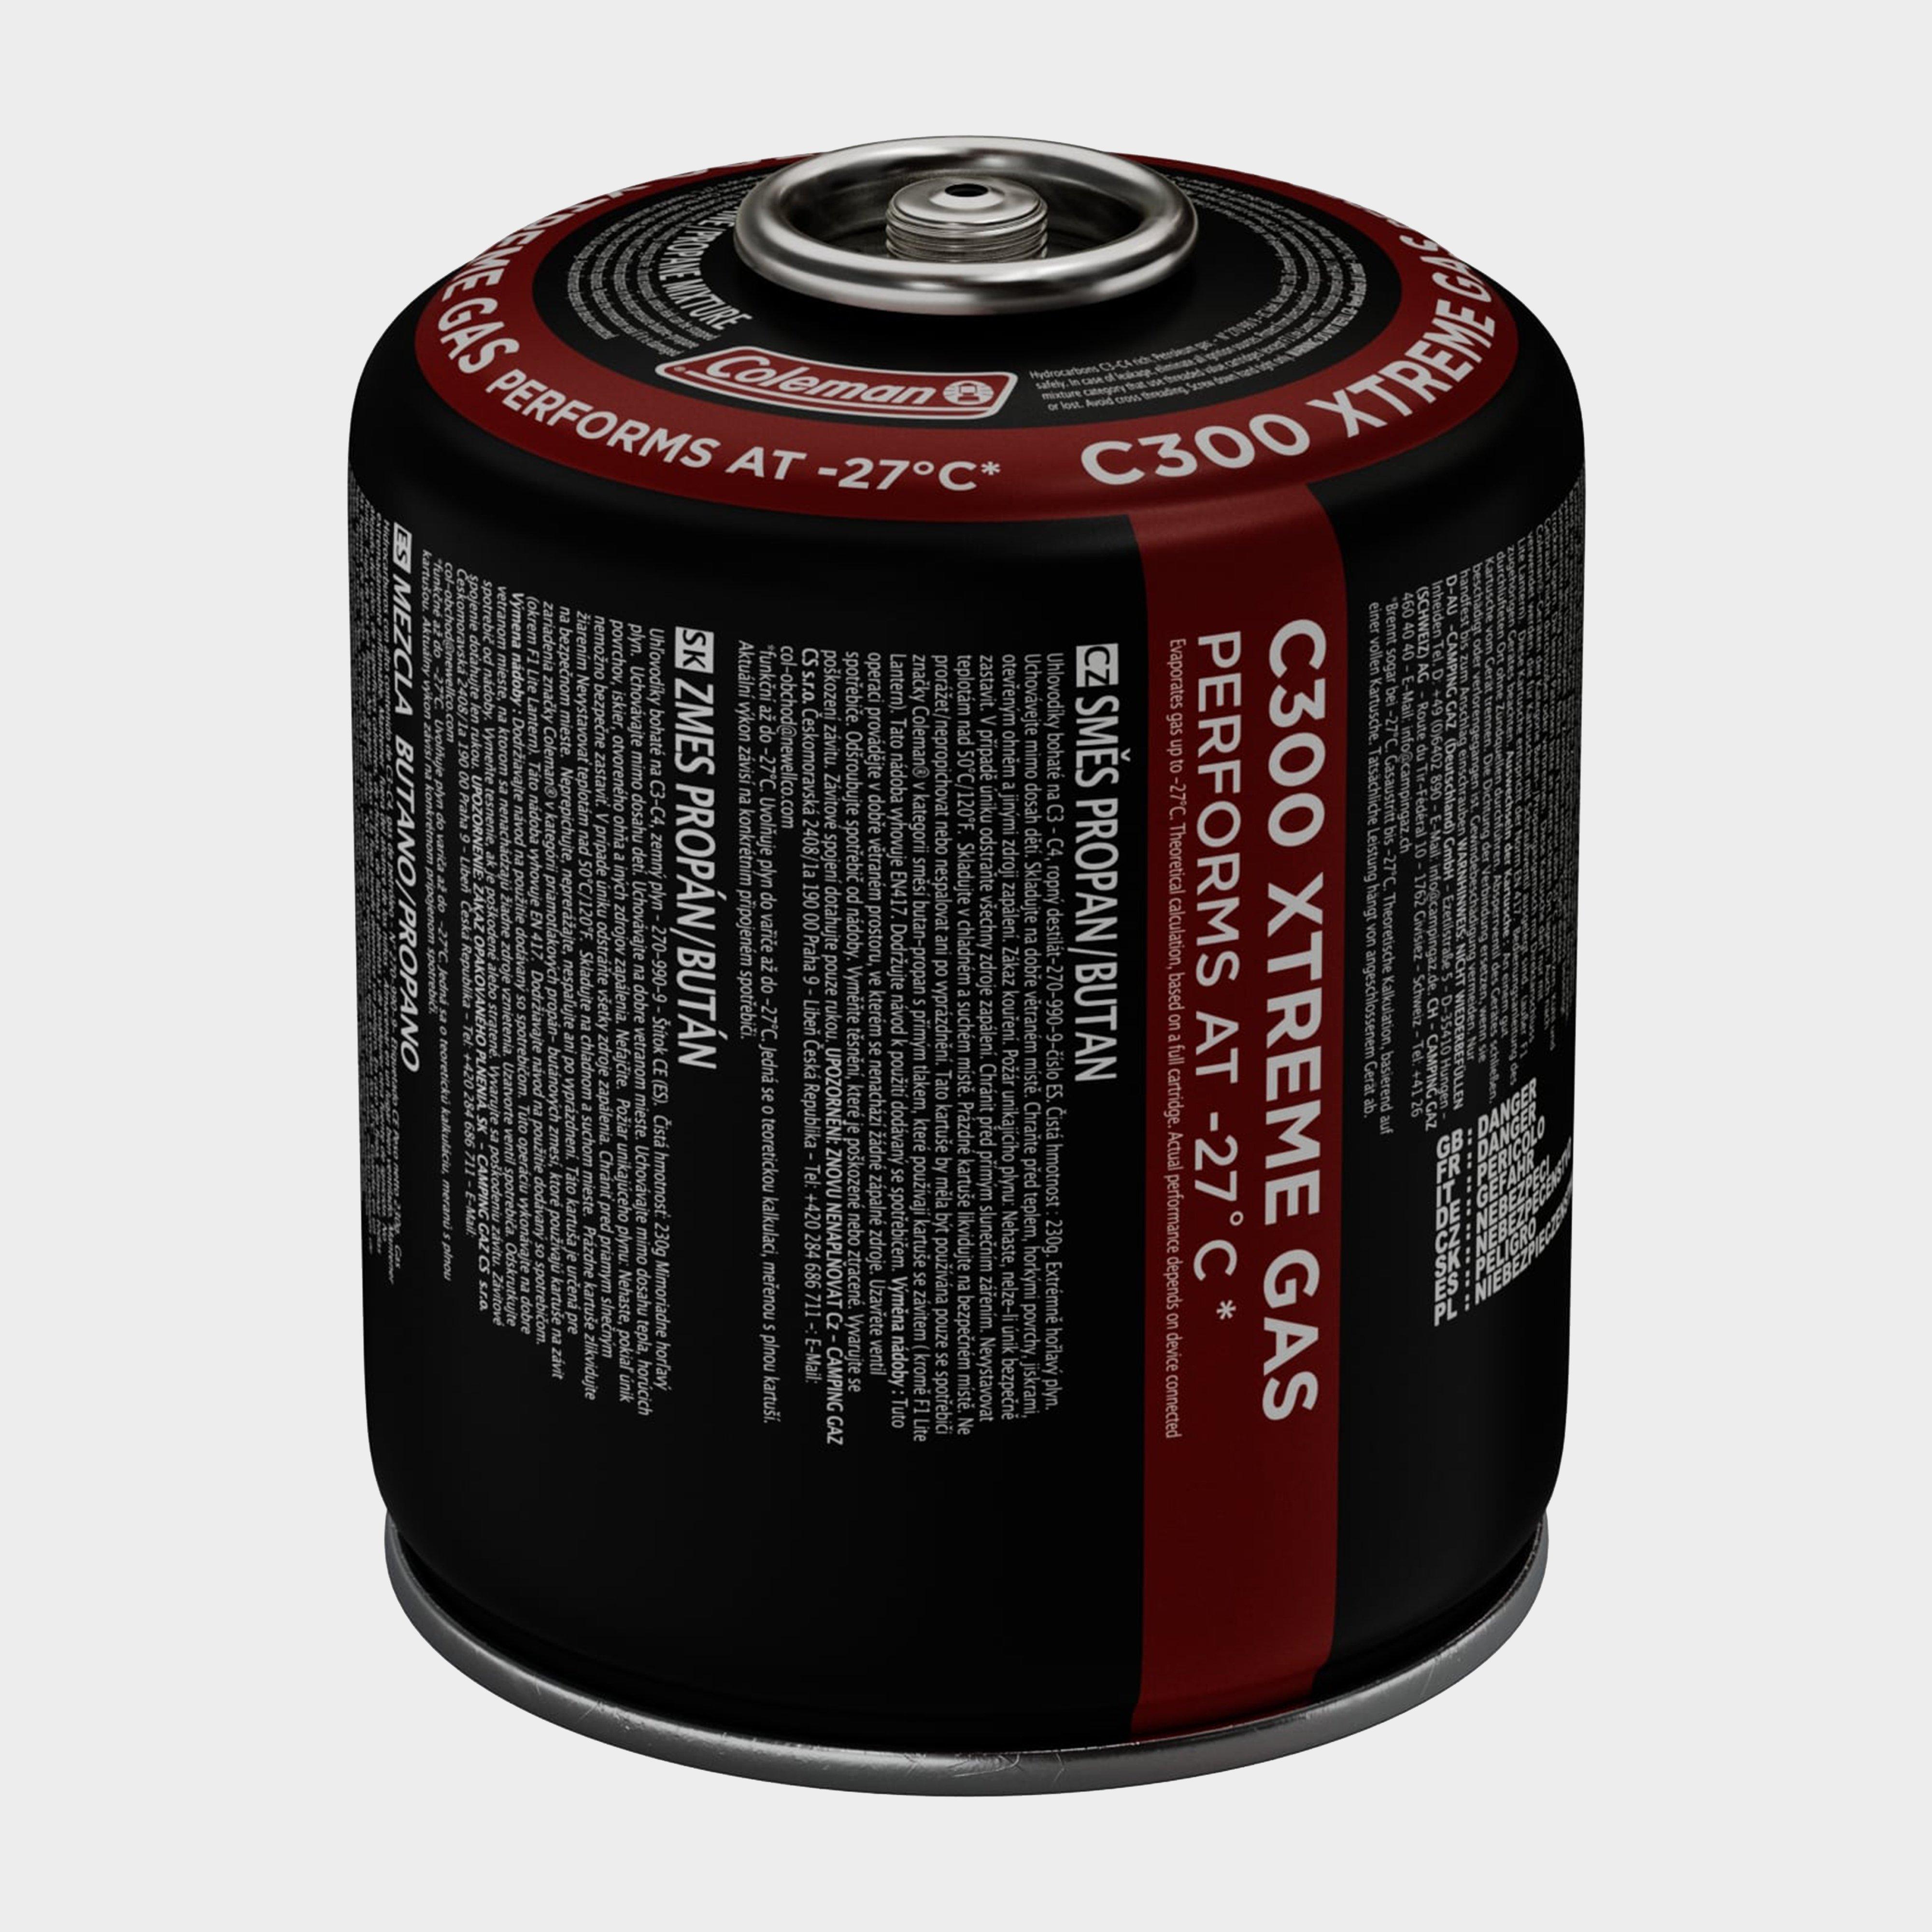 Coleman Coleman C300 Extreme Gas Cartridge - White, White